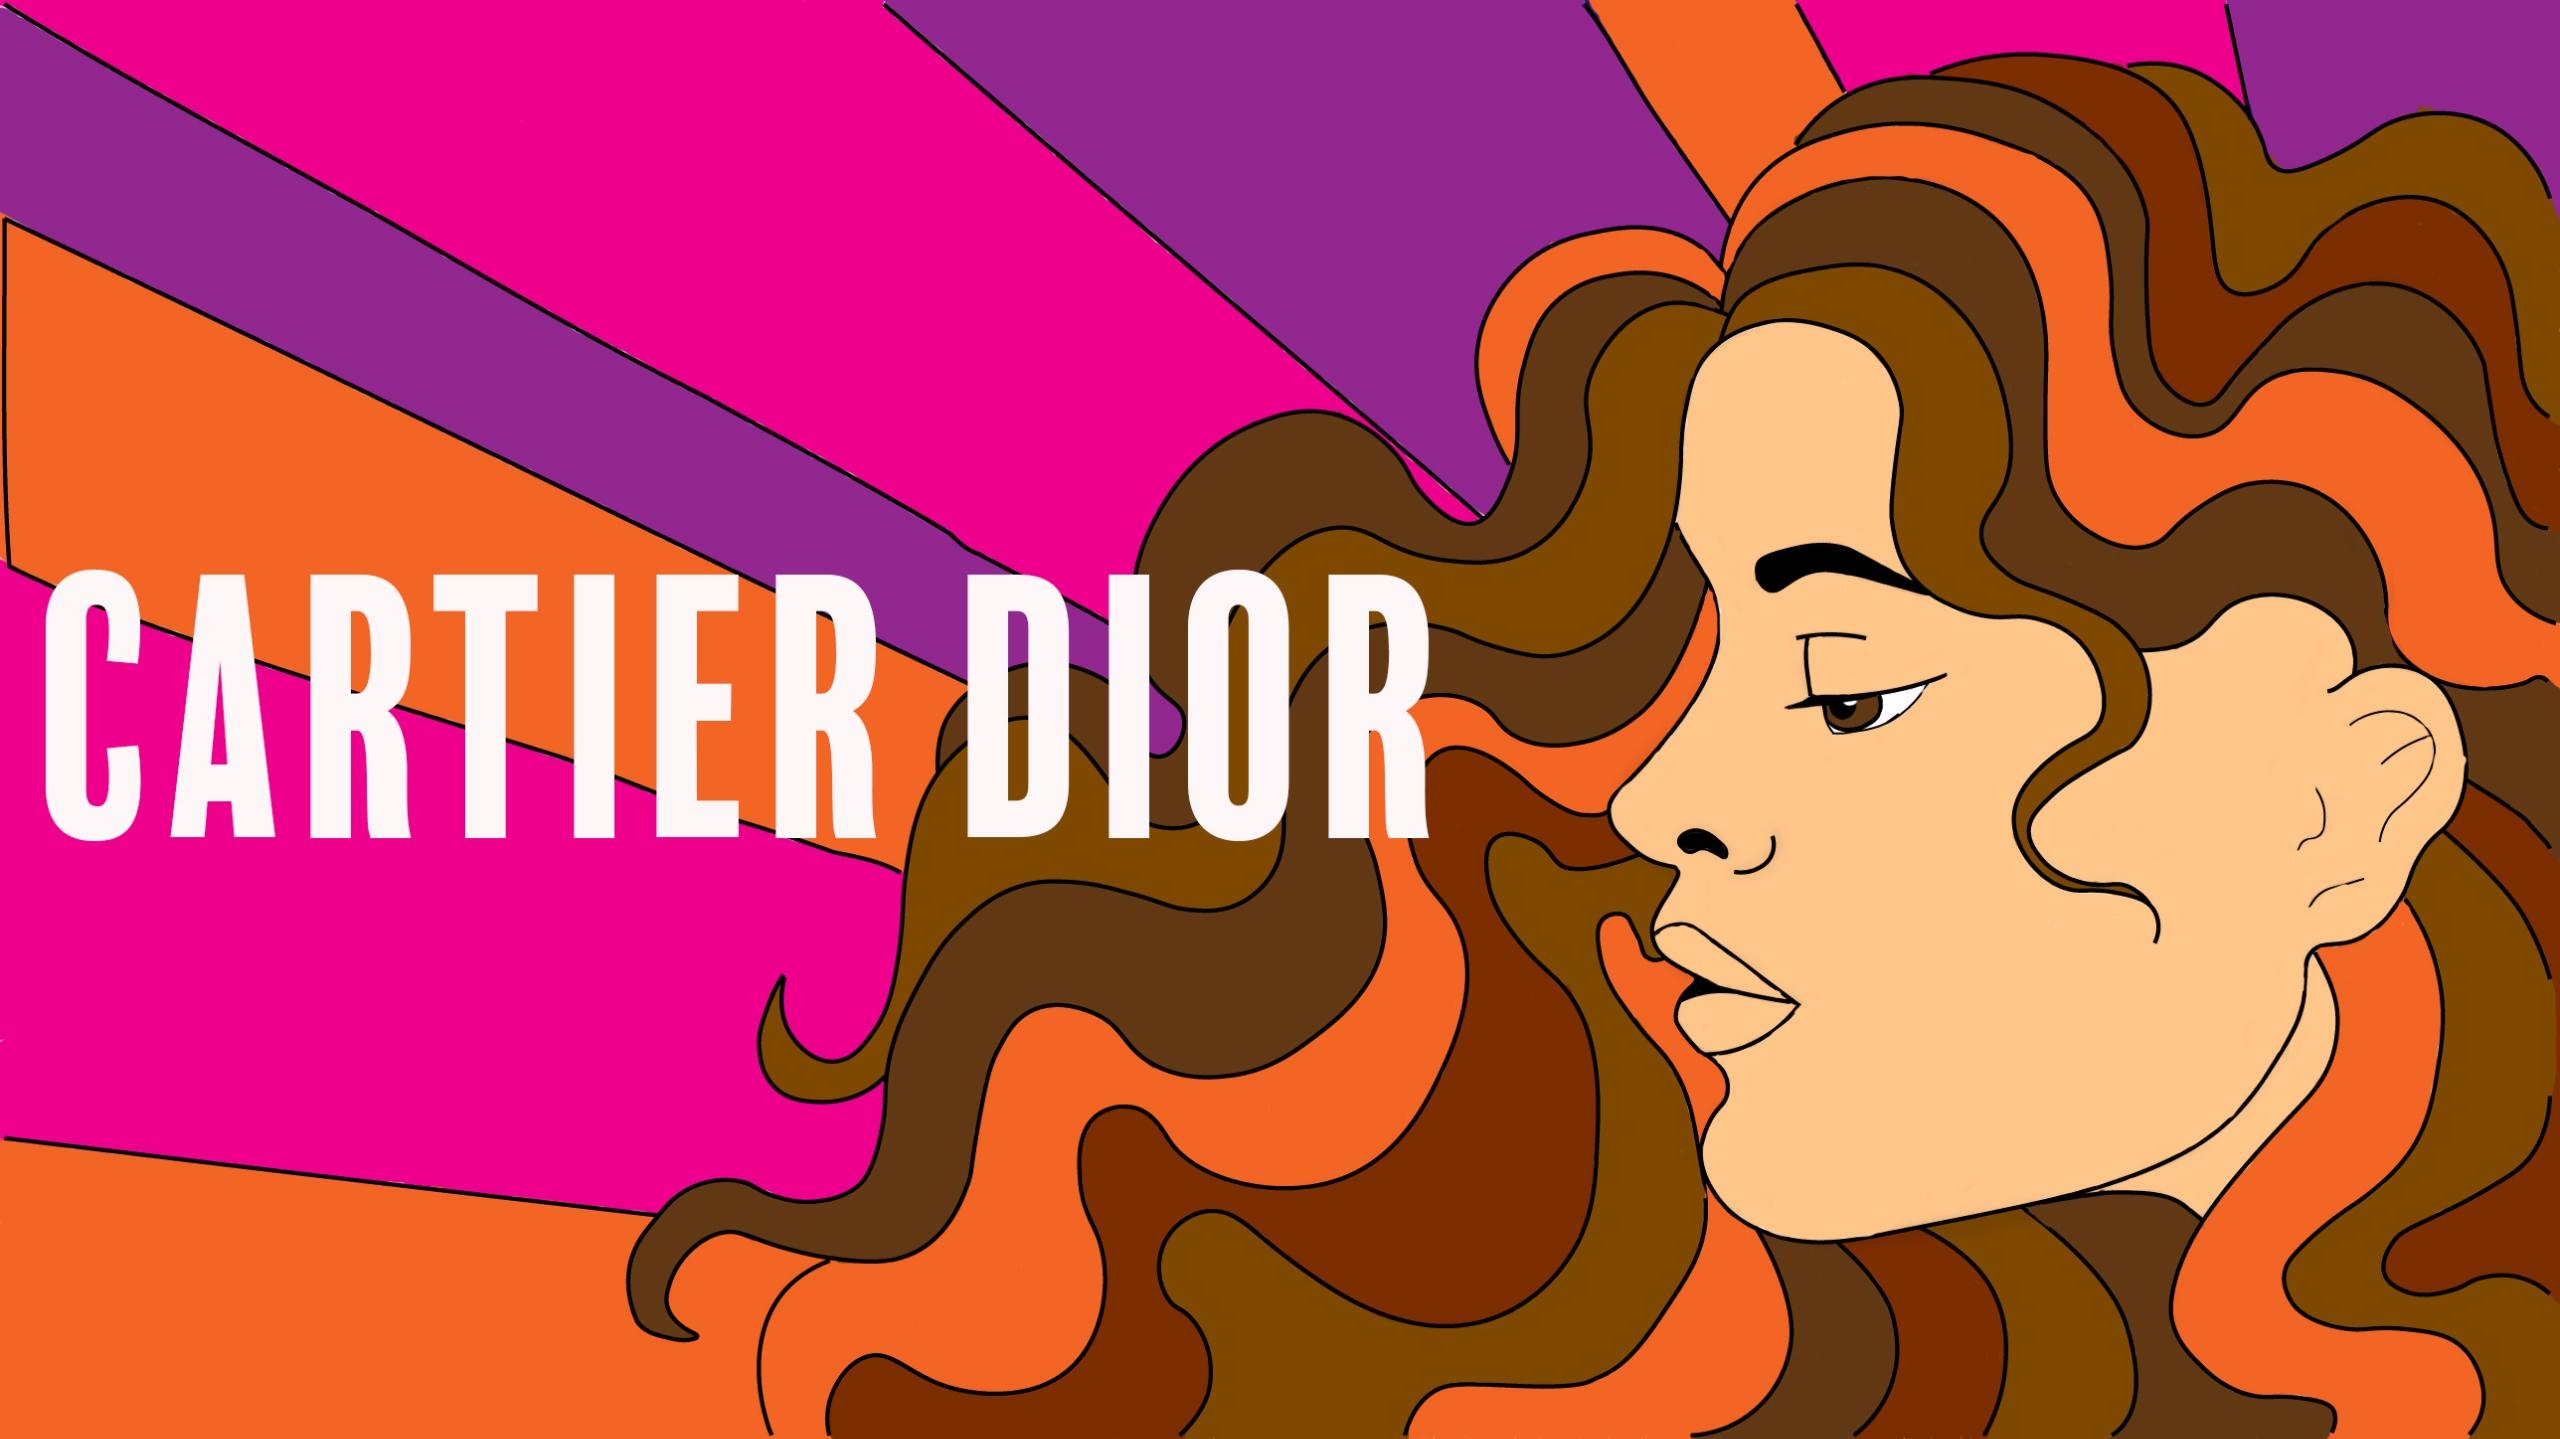 Cartier Dior (@cartierdior) Cover Image